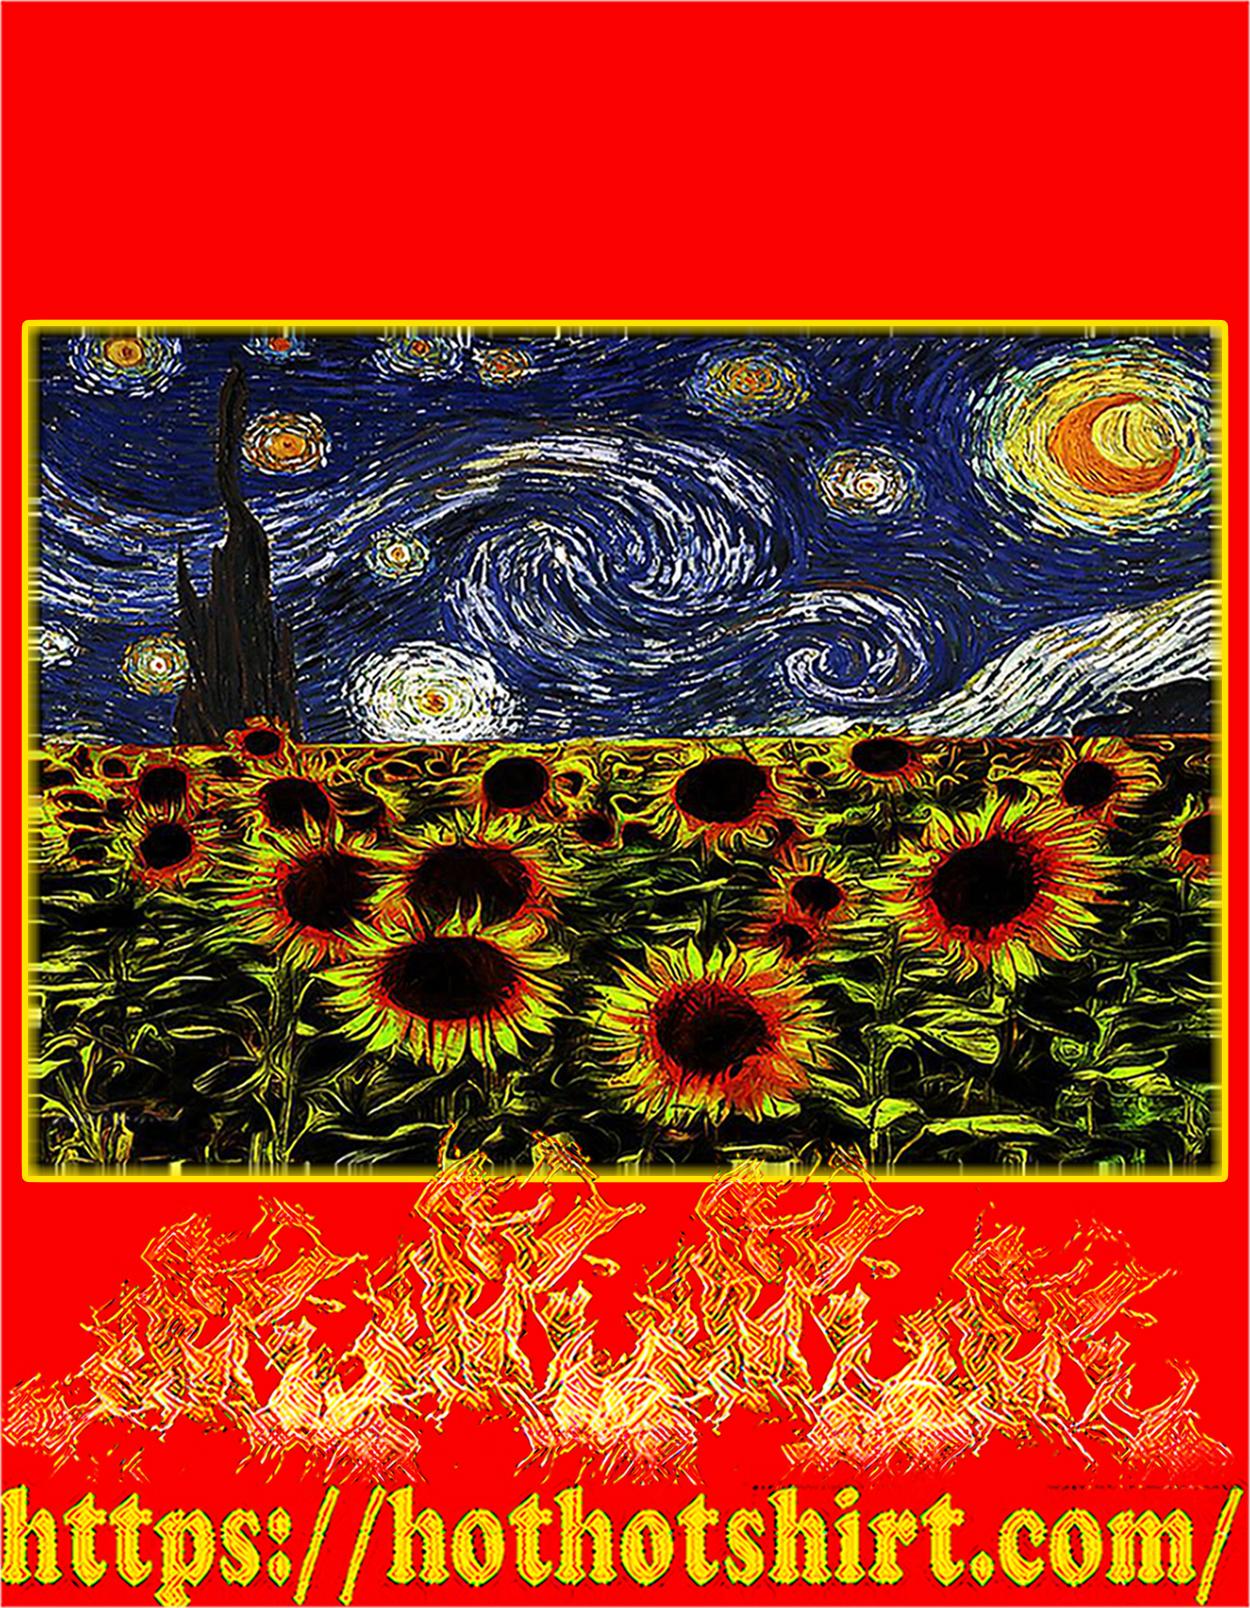 Sunflowers starry night van gogh poster - A3